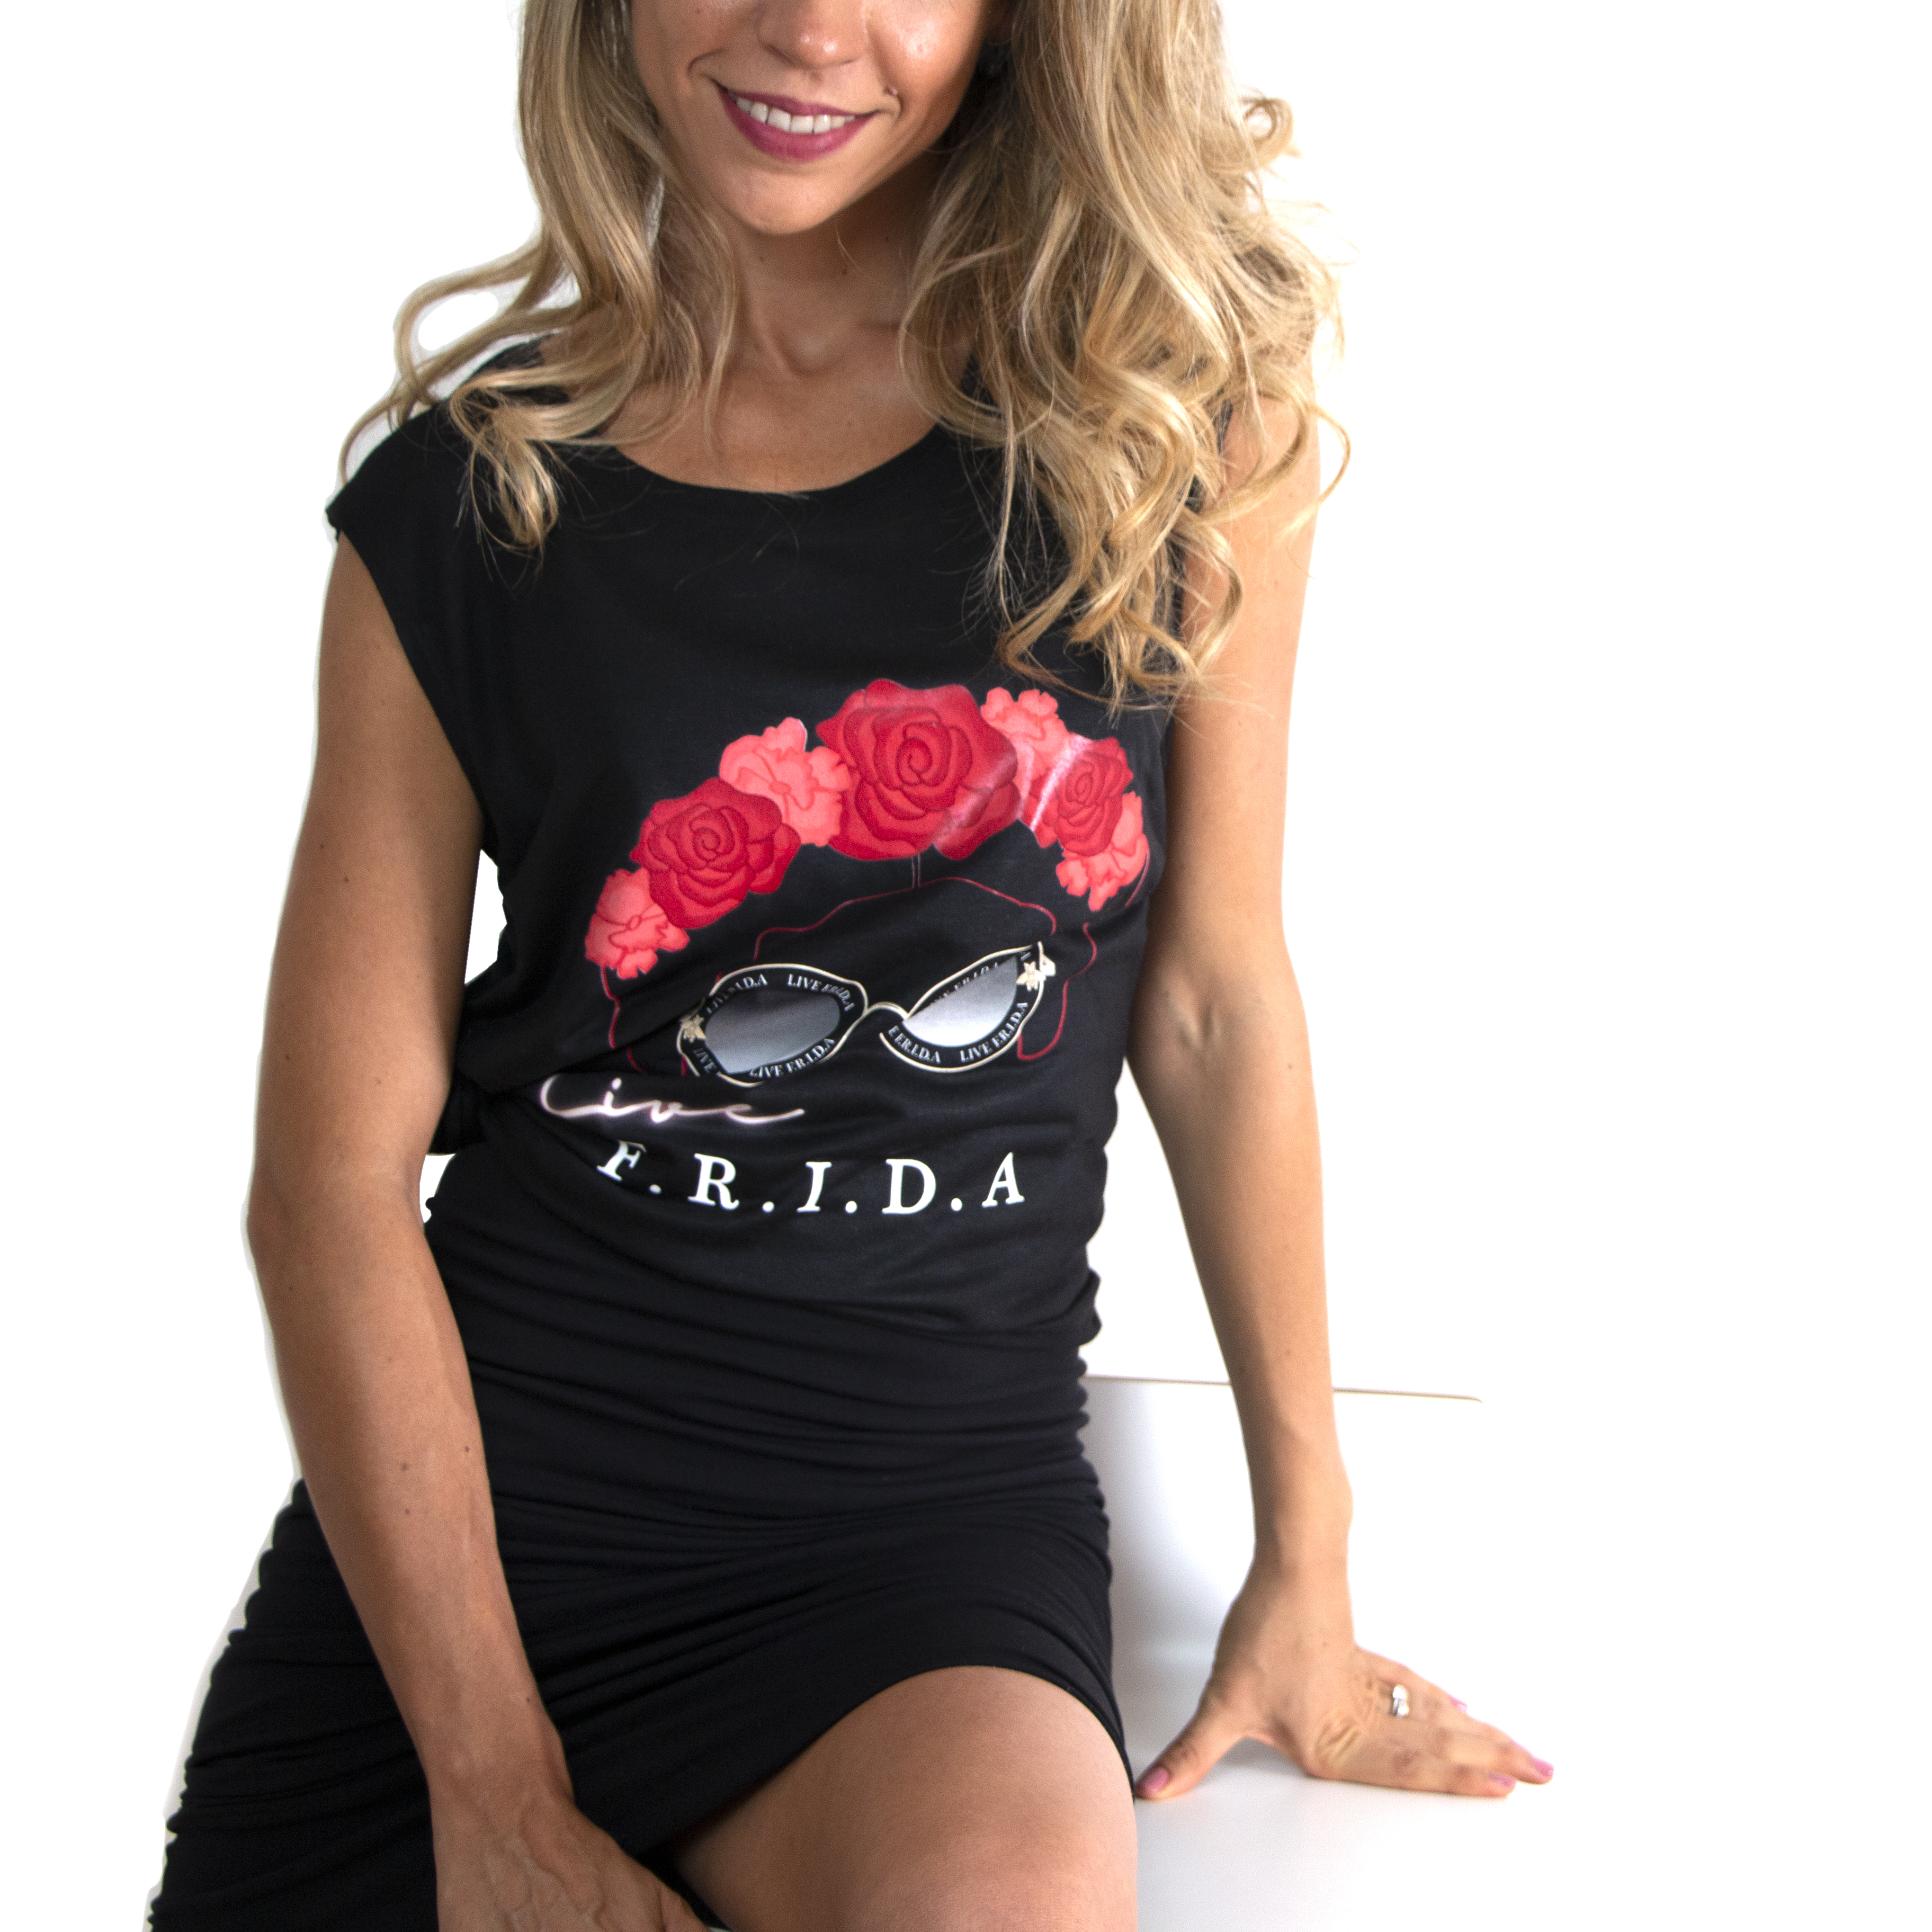 camisetas tirantes mujer ecologica